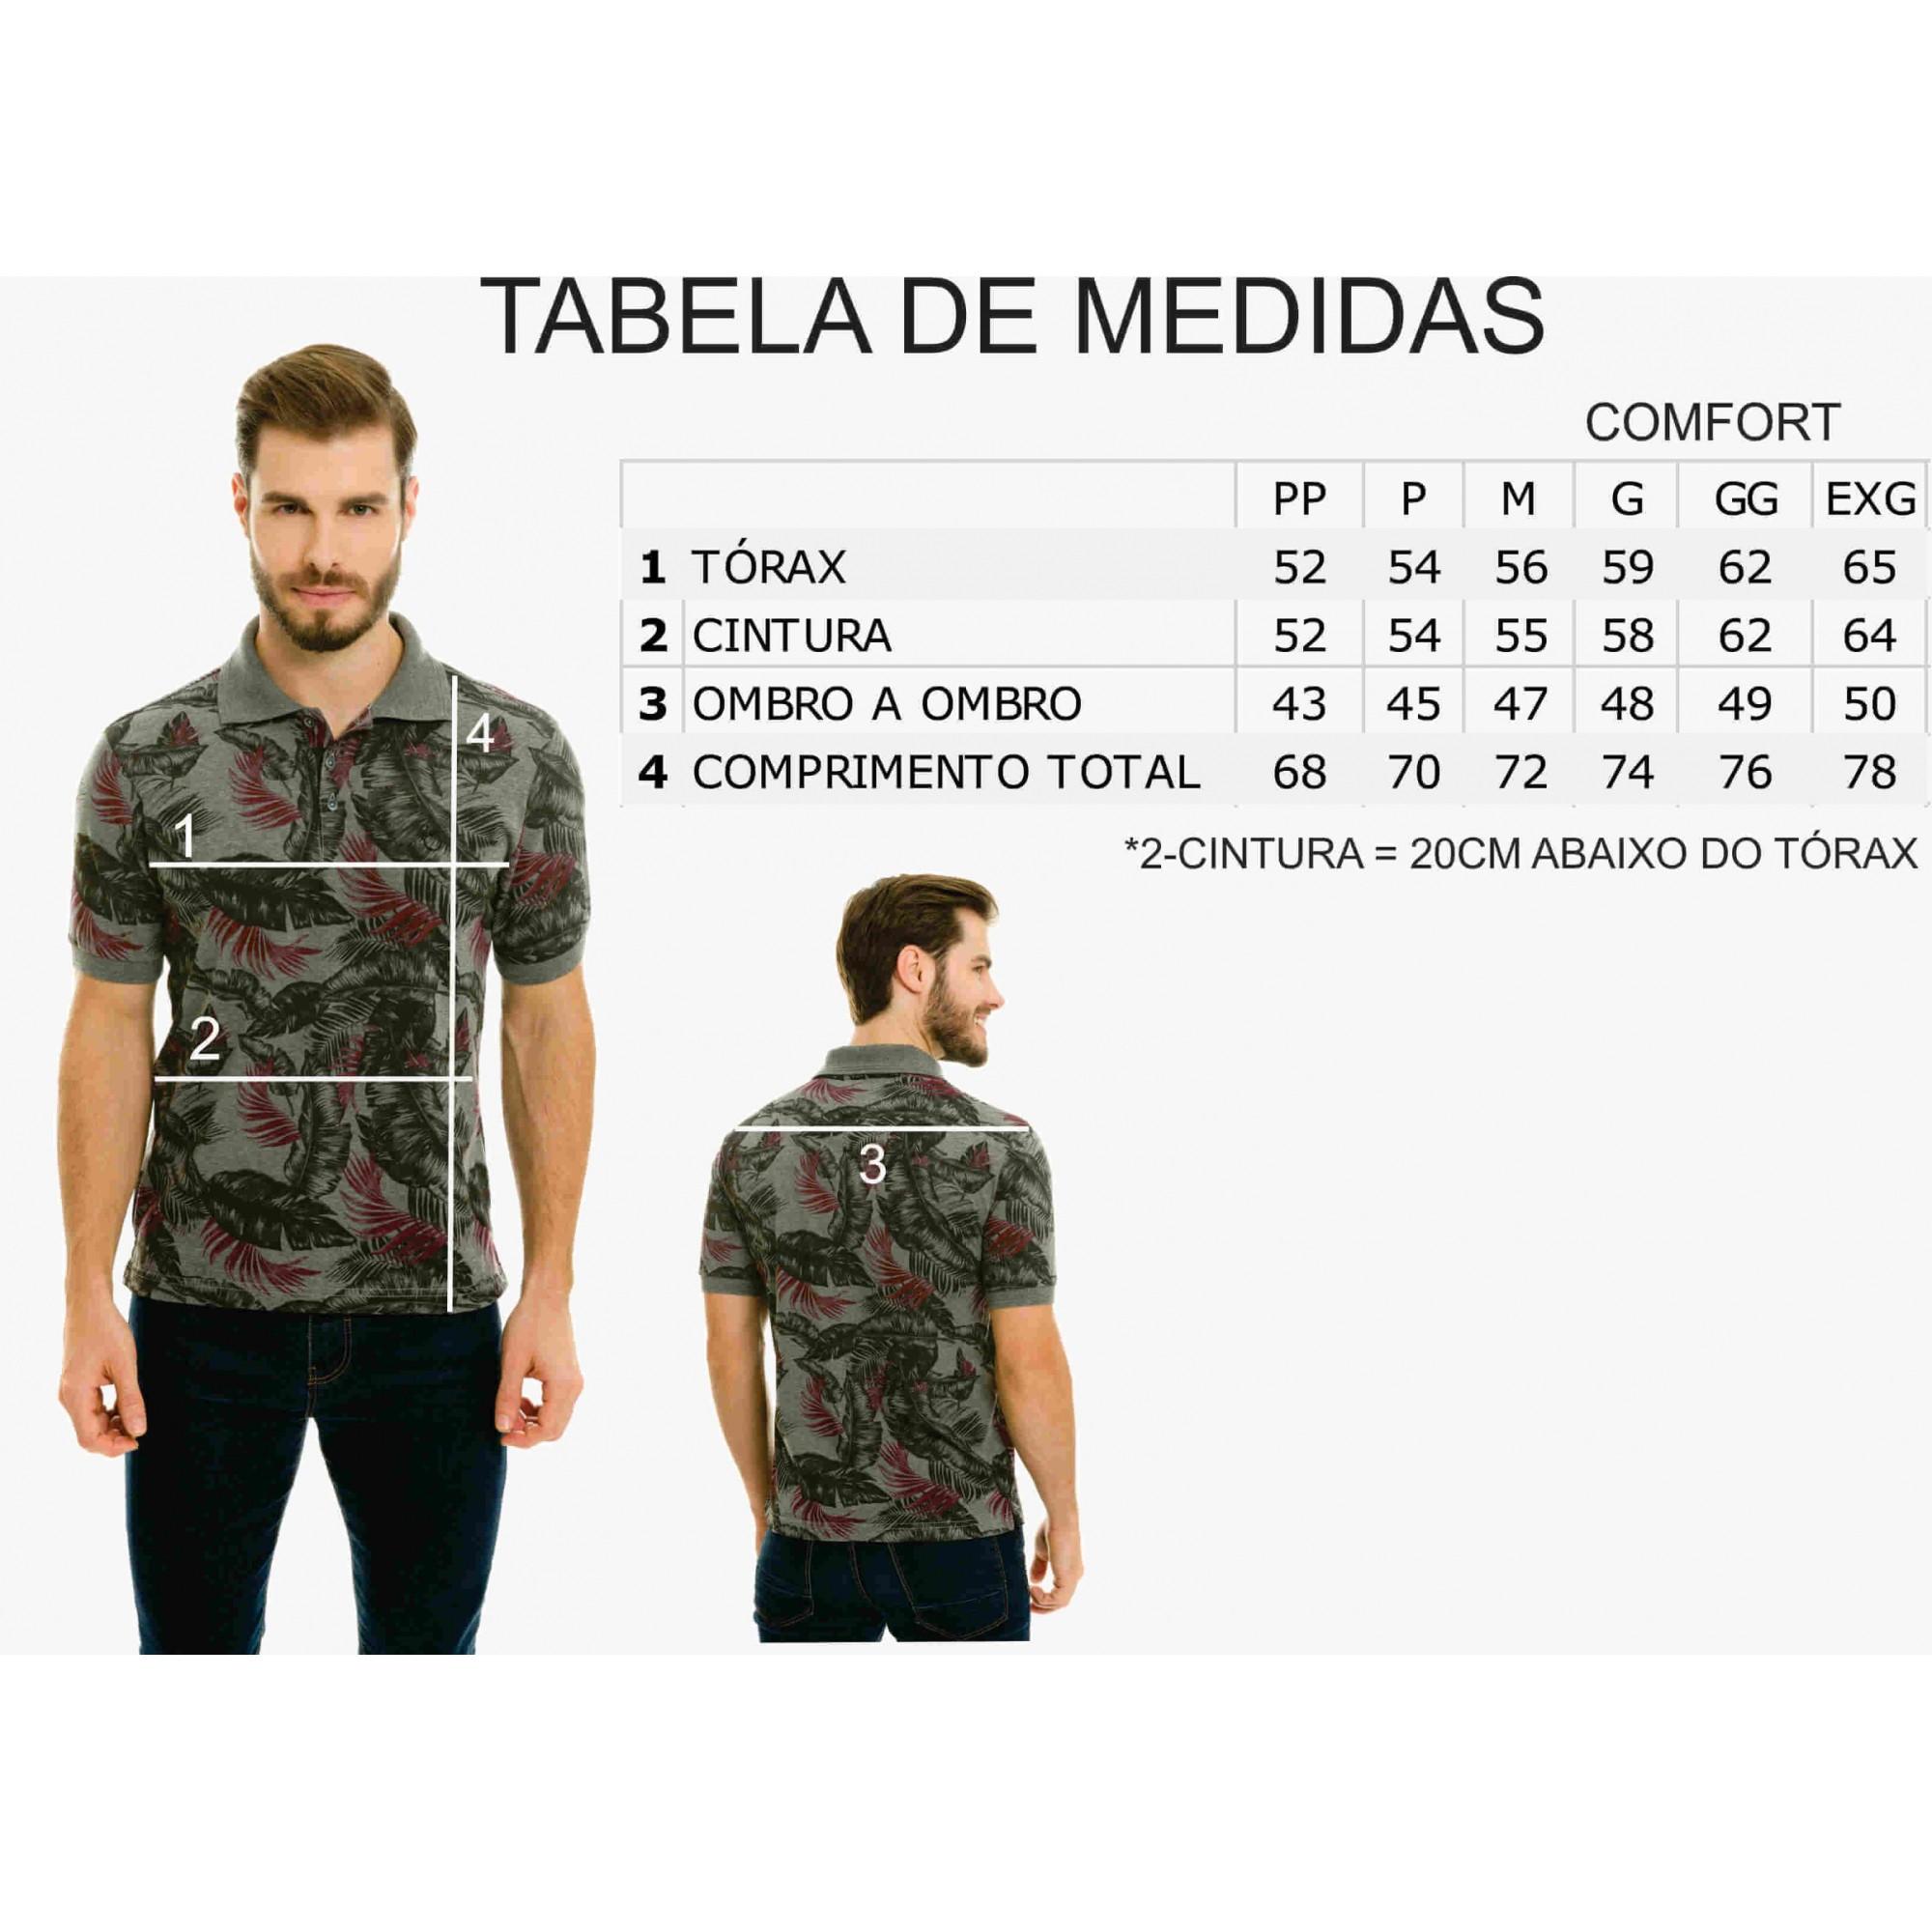 Camisa Gola Polo Olimpo Malha Jacguard com Bolso